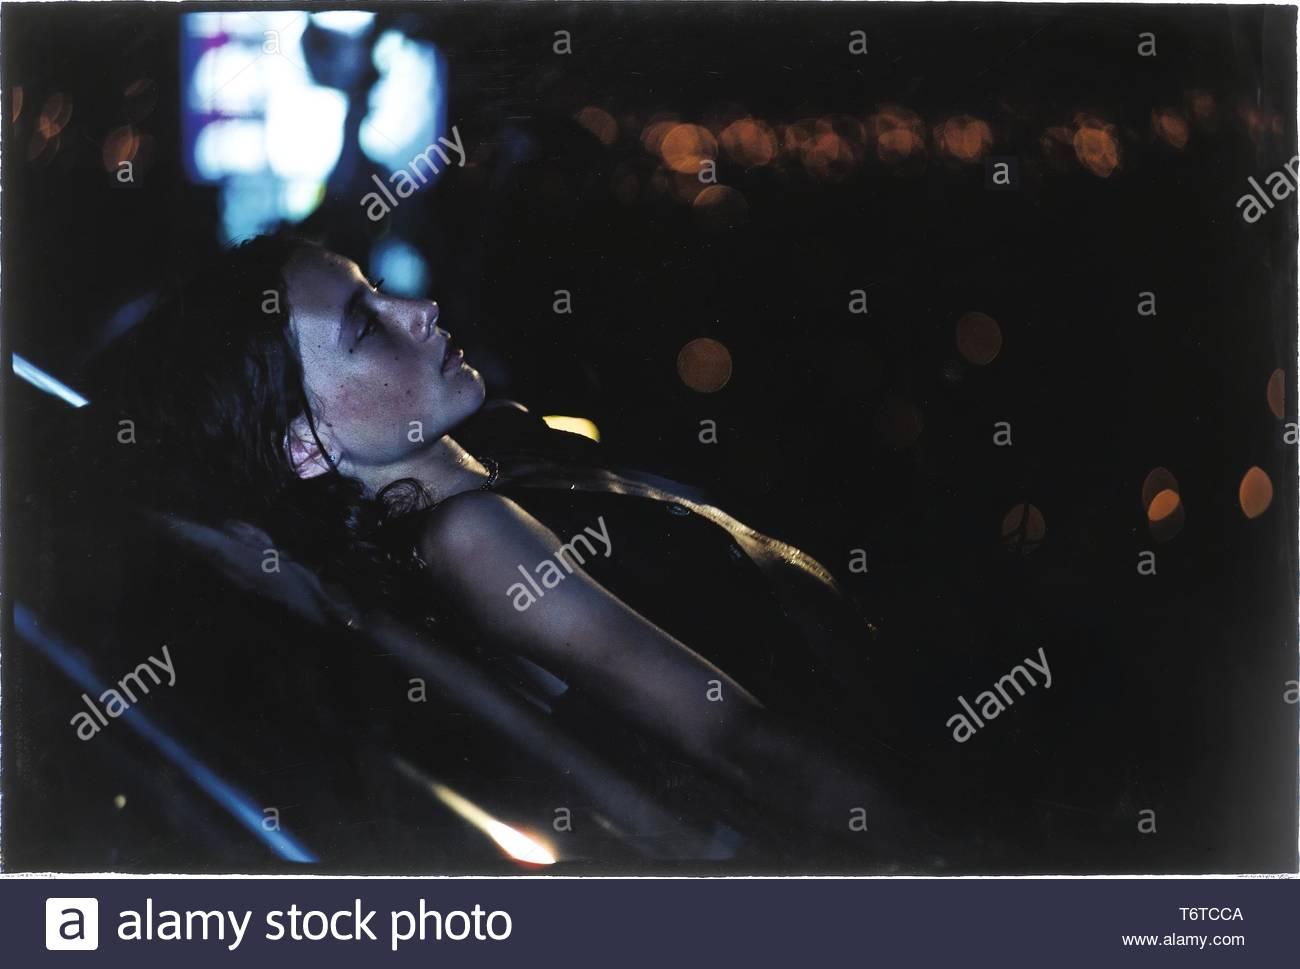 Bill Henson-Untitled, 1998-1999 - Stock Image